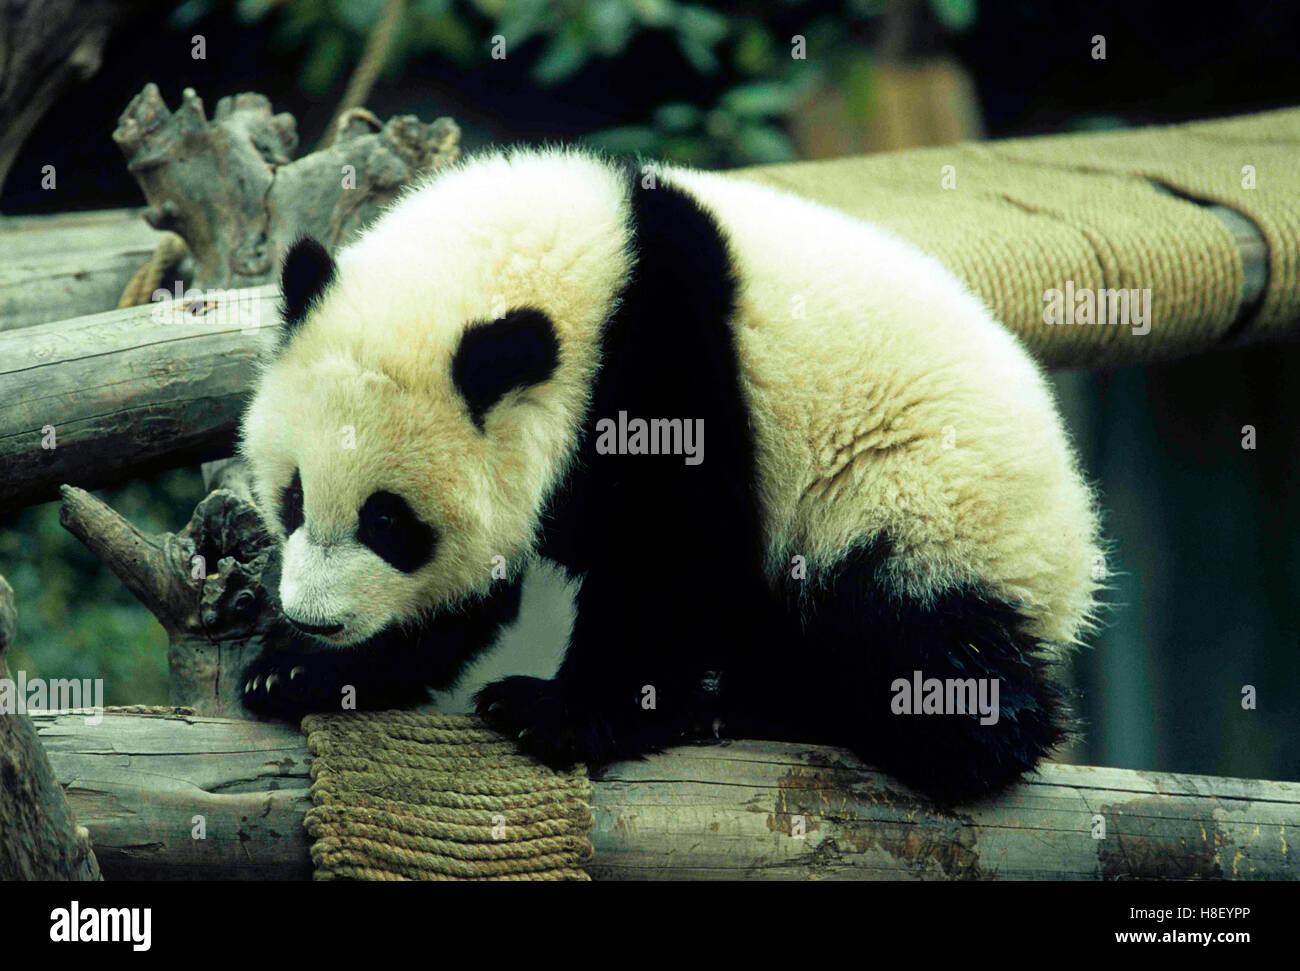 Cute Pandas Cubs